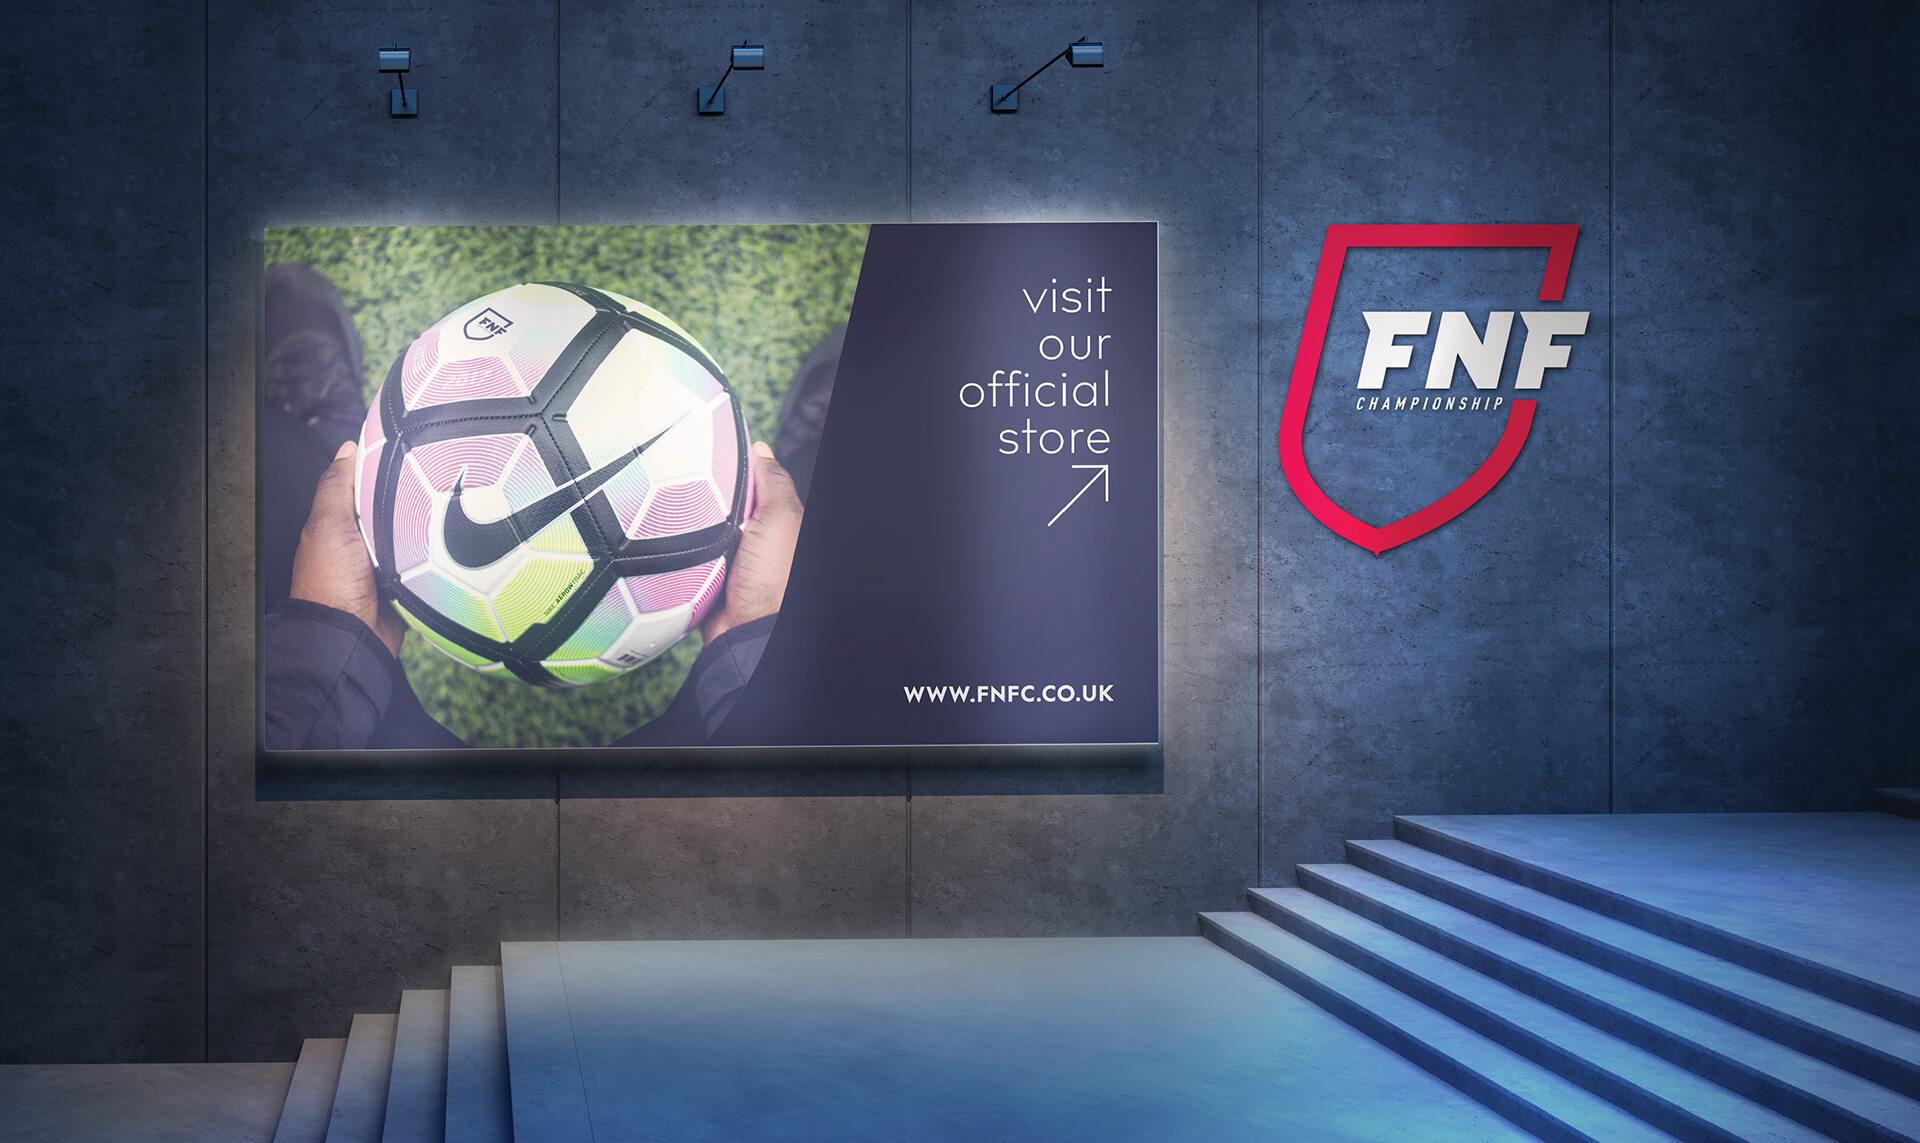 Branding-FNF-Championship-Nacione-11